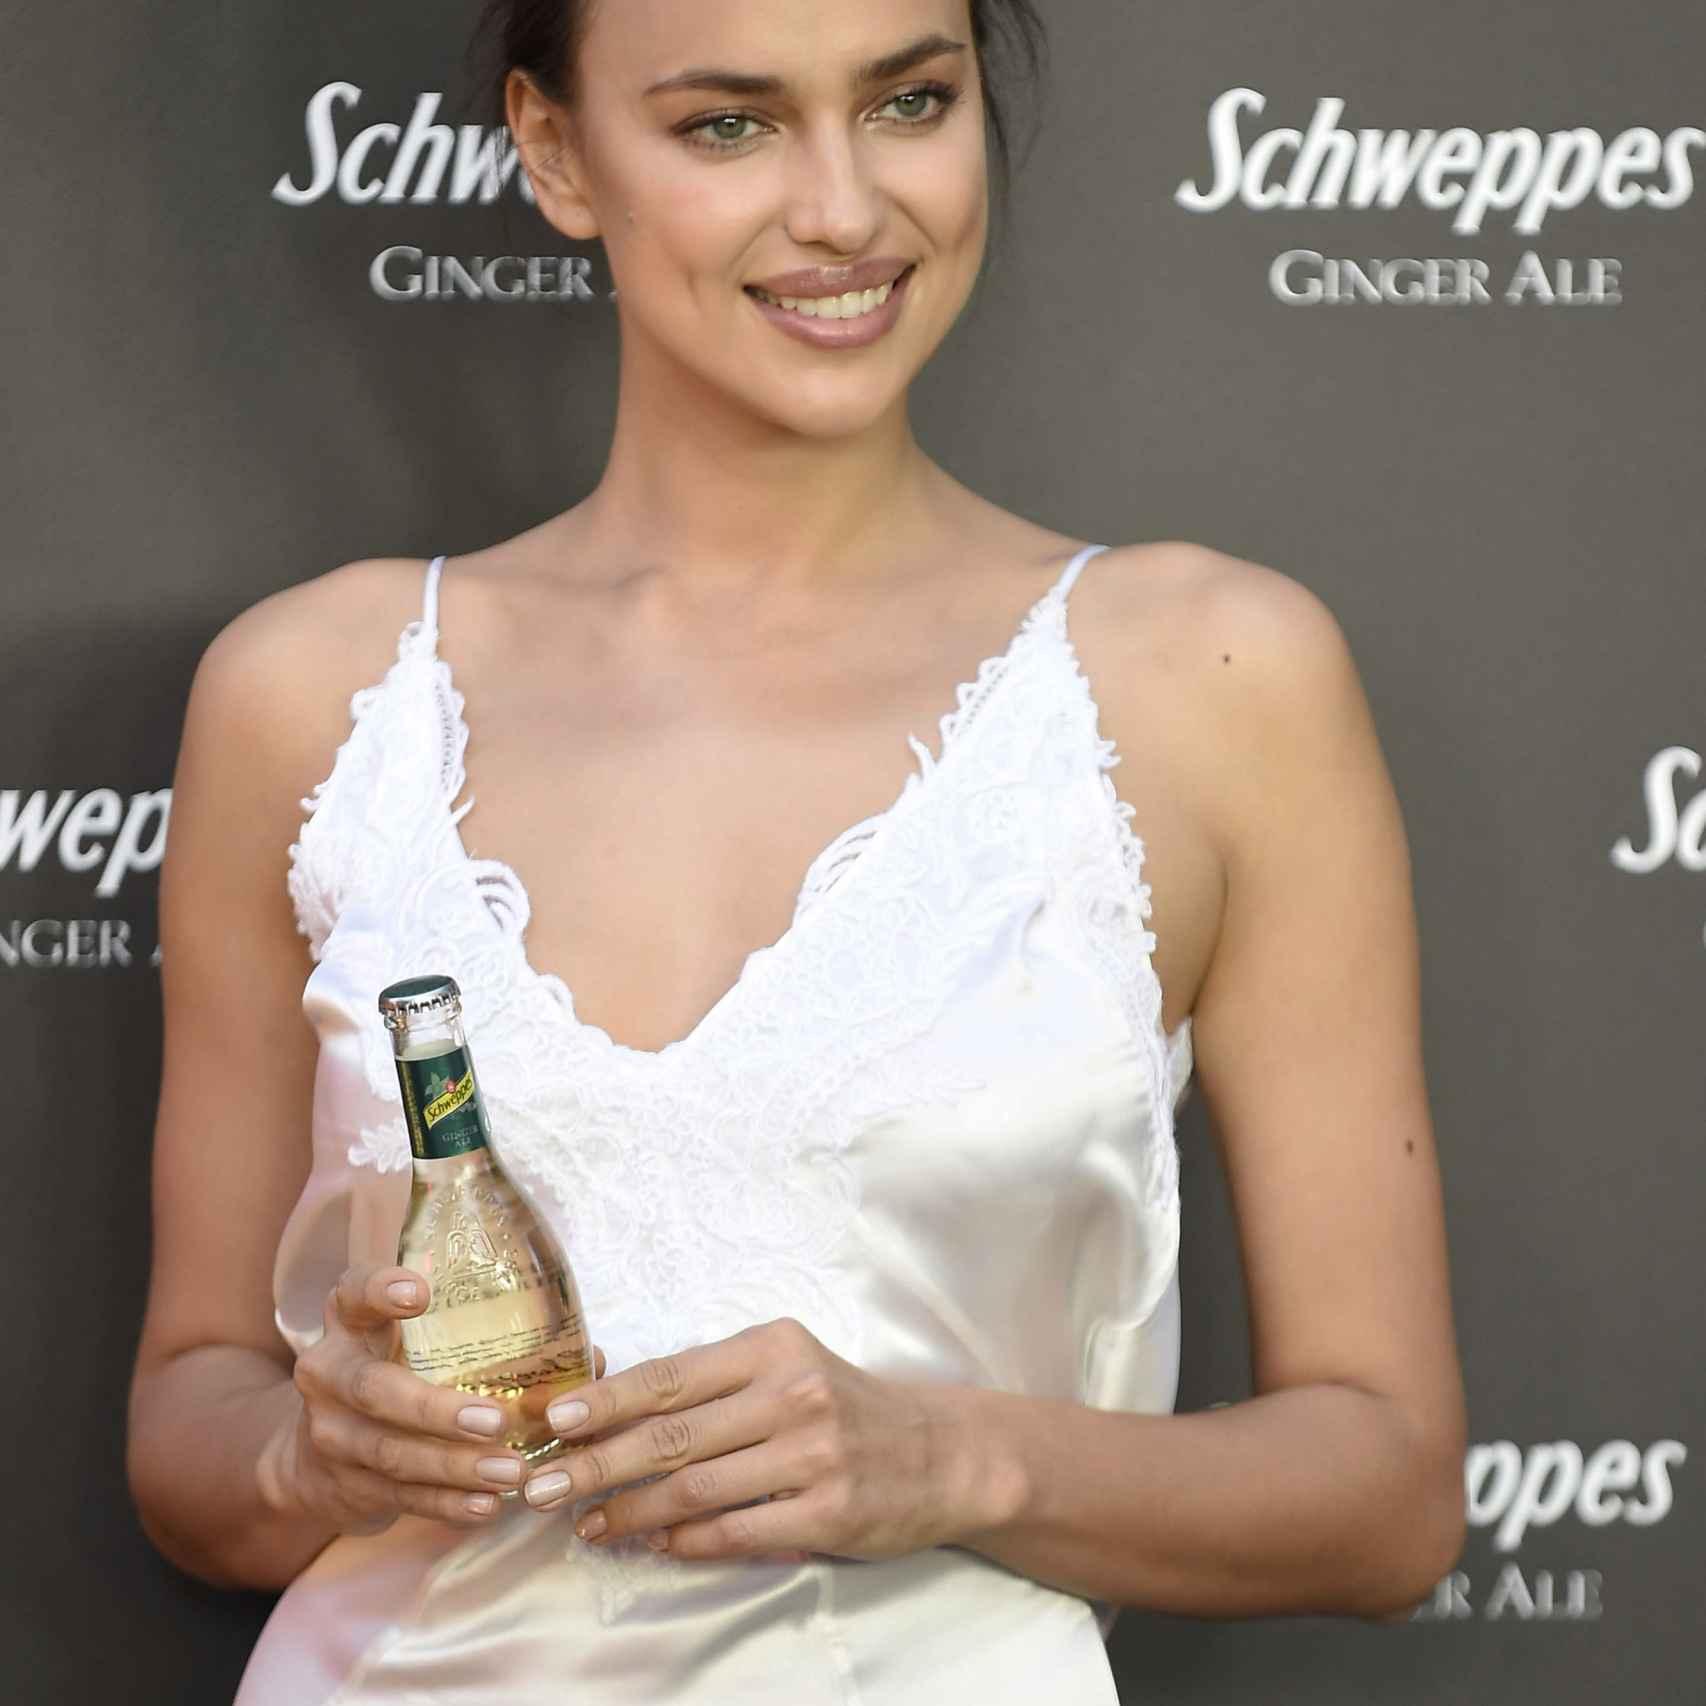 La modelo rusa en una fiesta en madrid